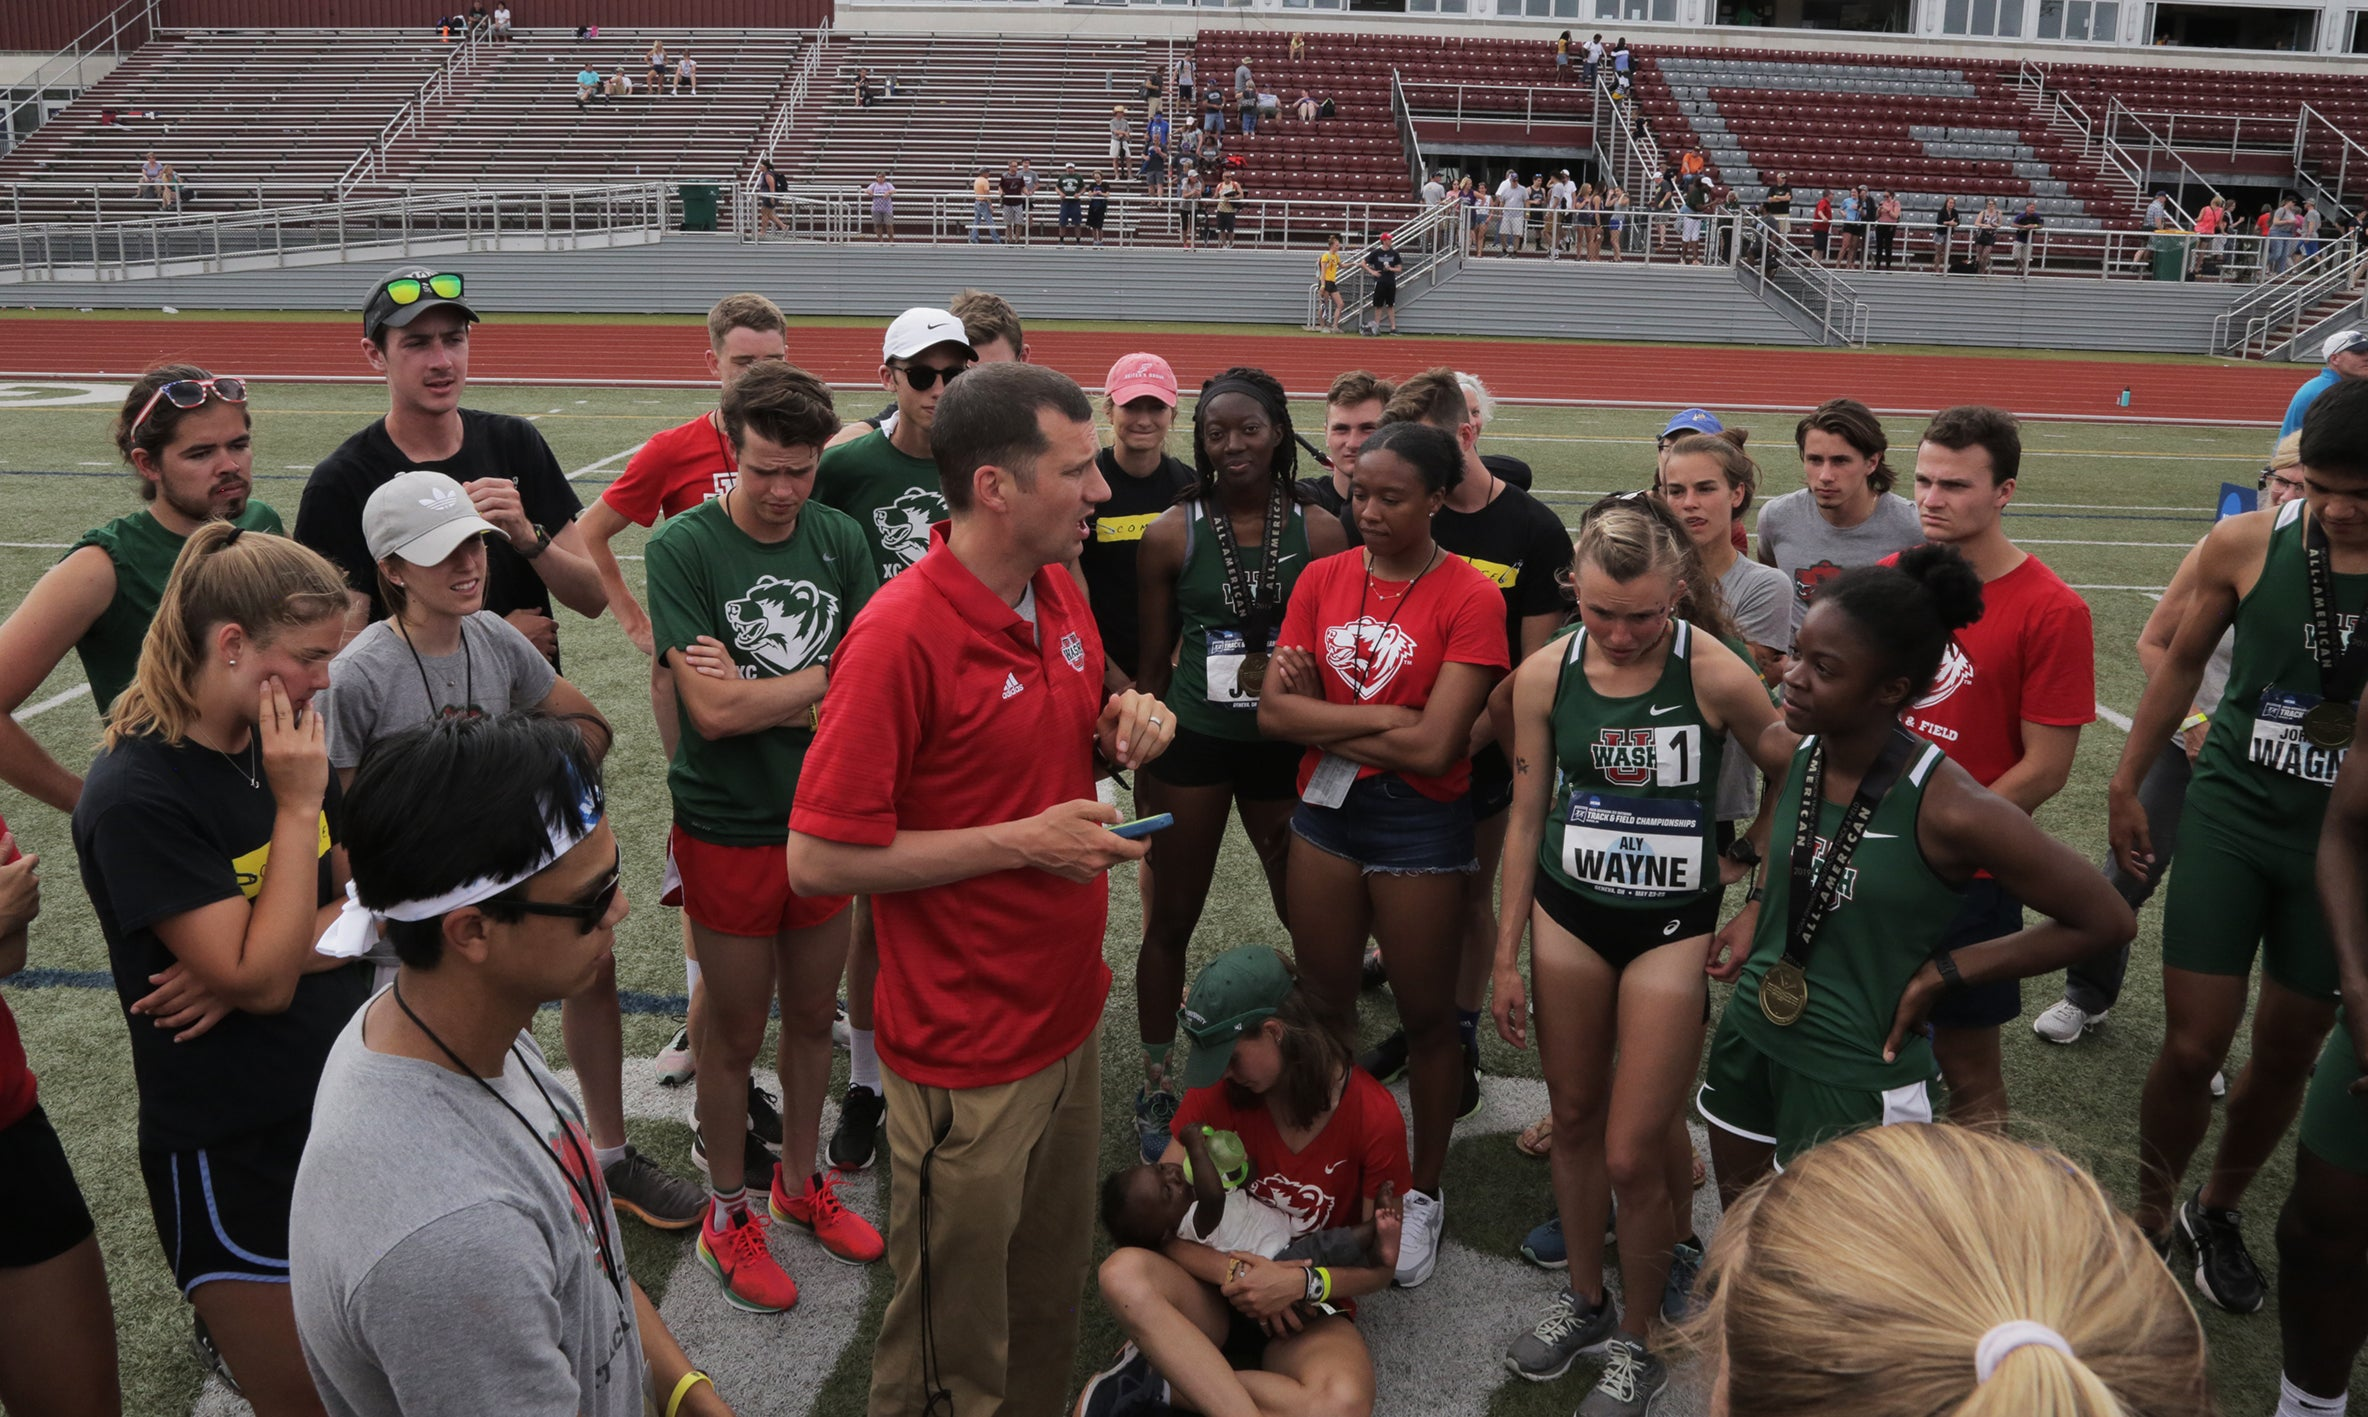 Jeff Stiles and team